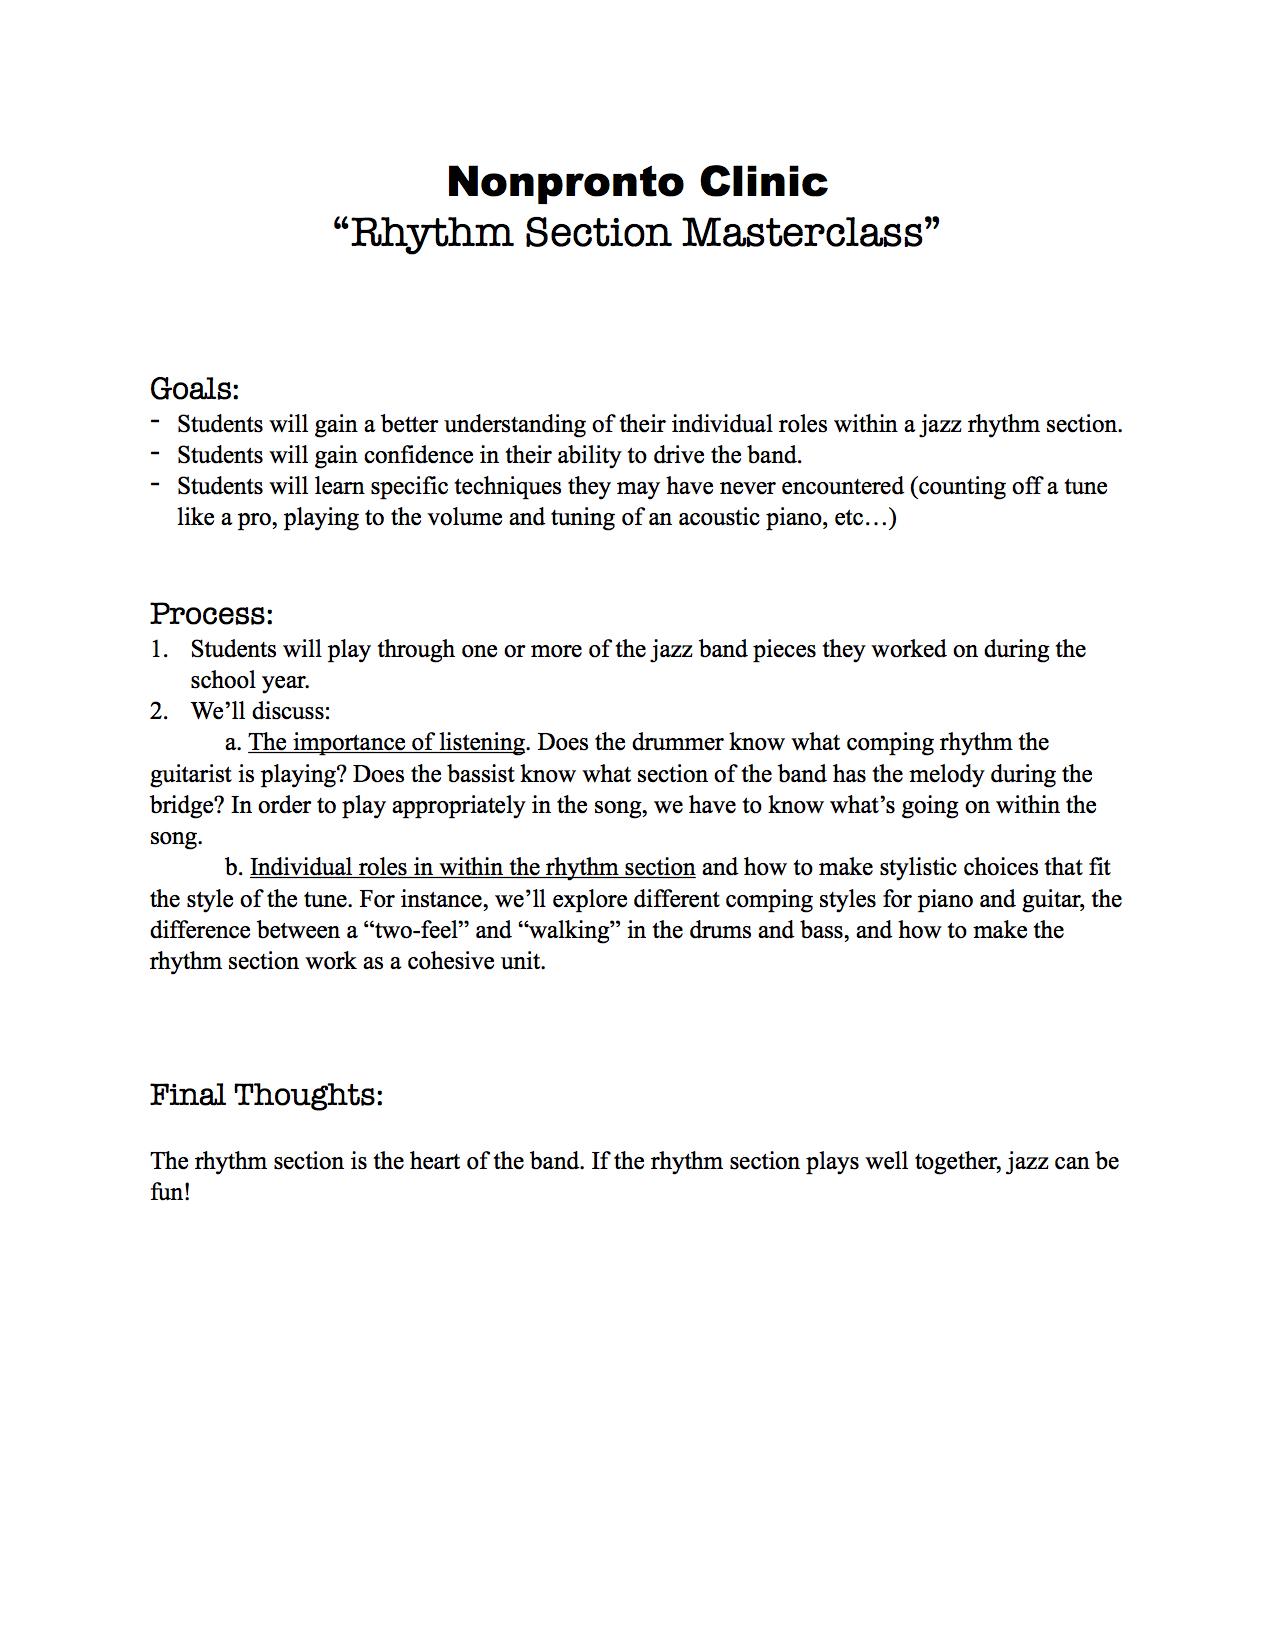 Rhythm Section Masterclass.jpg